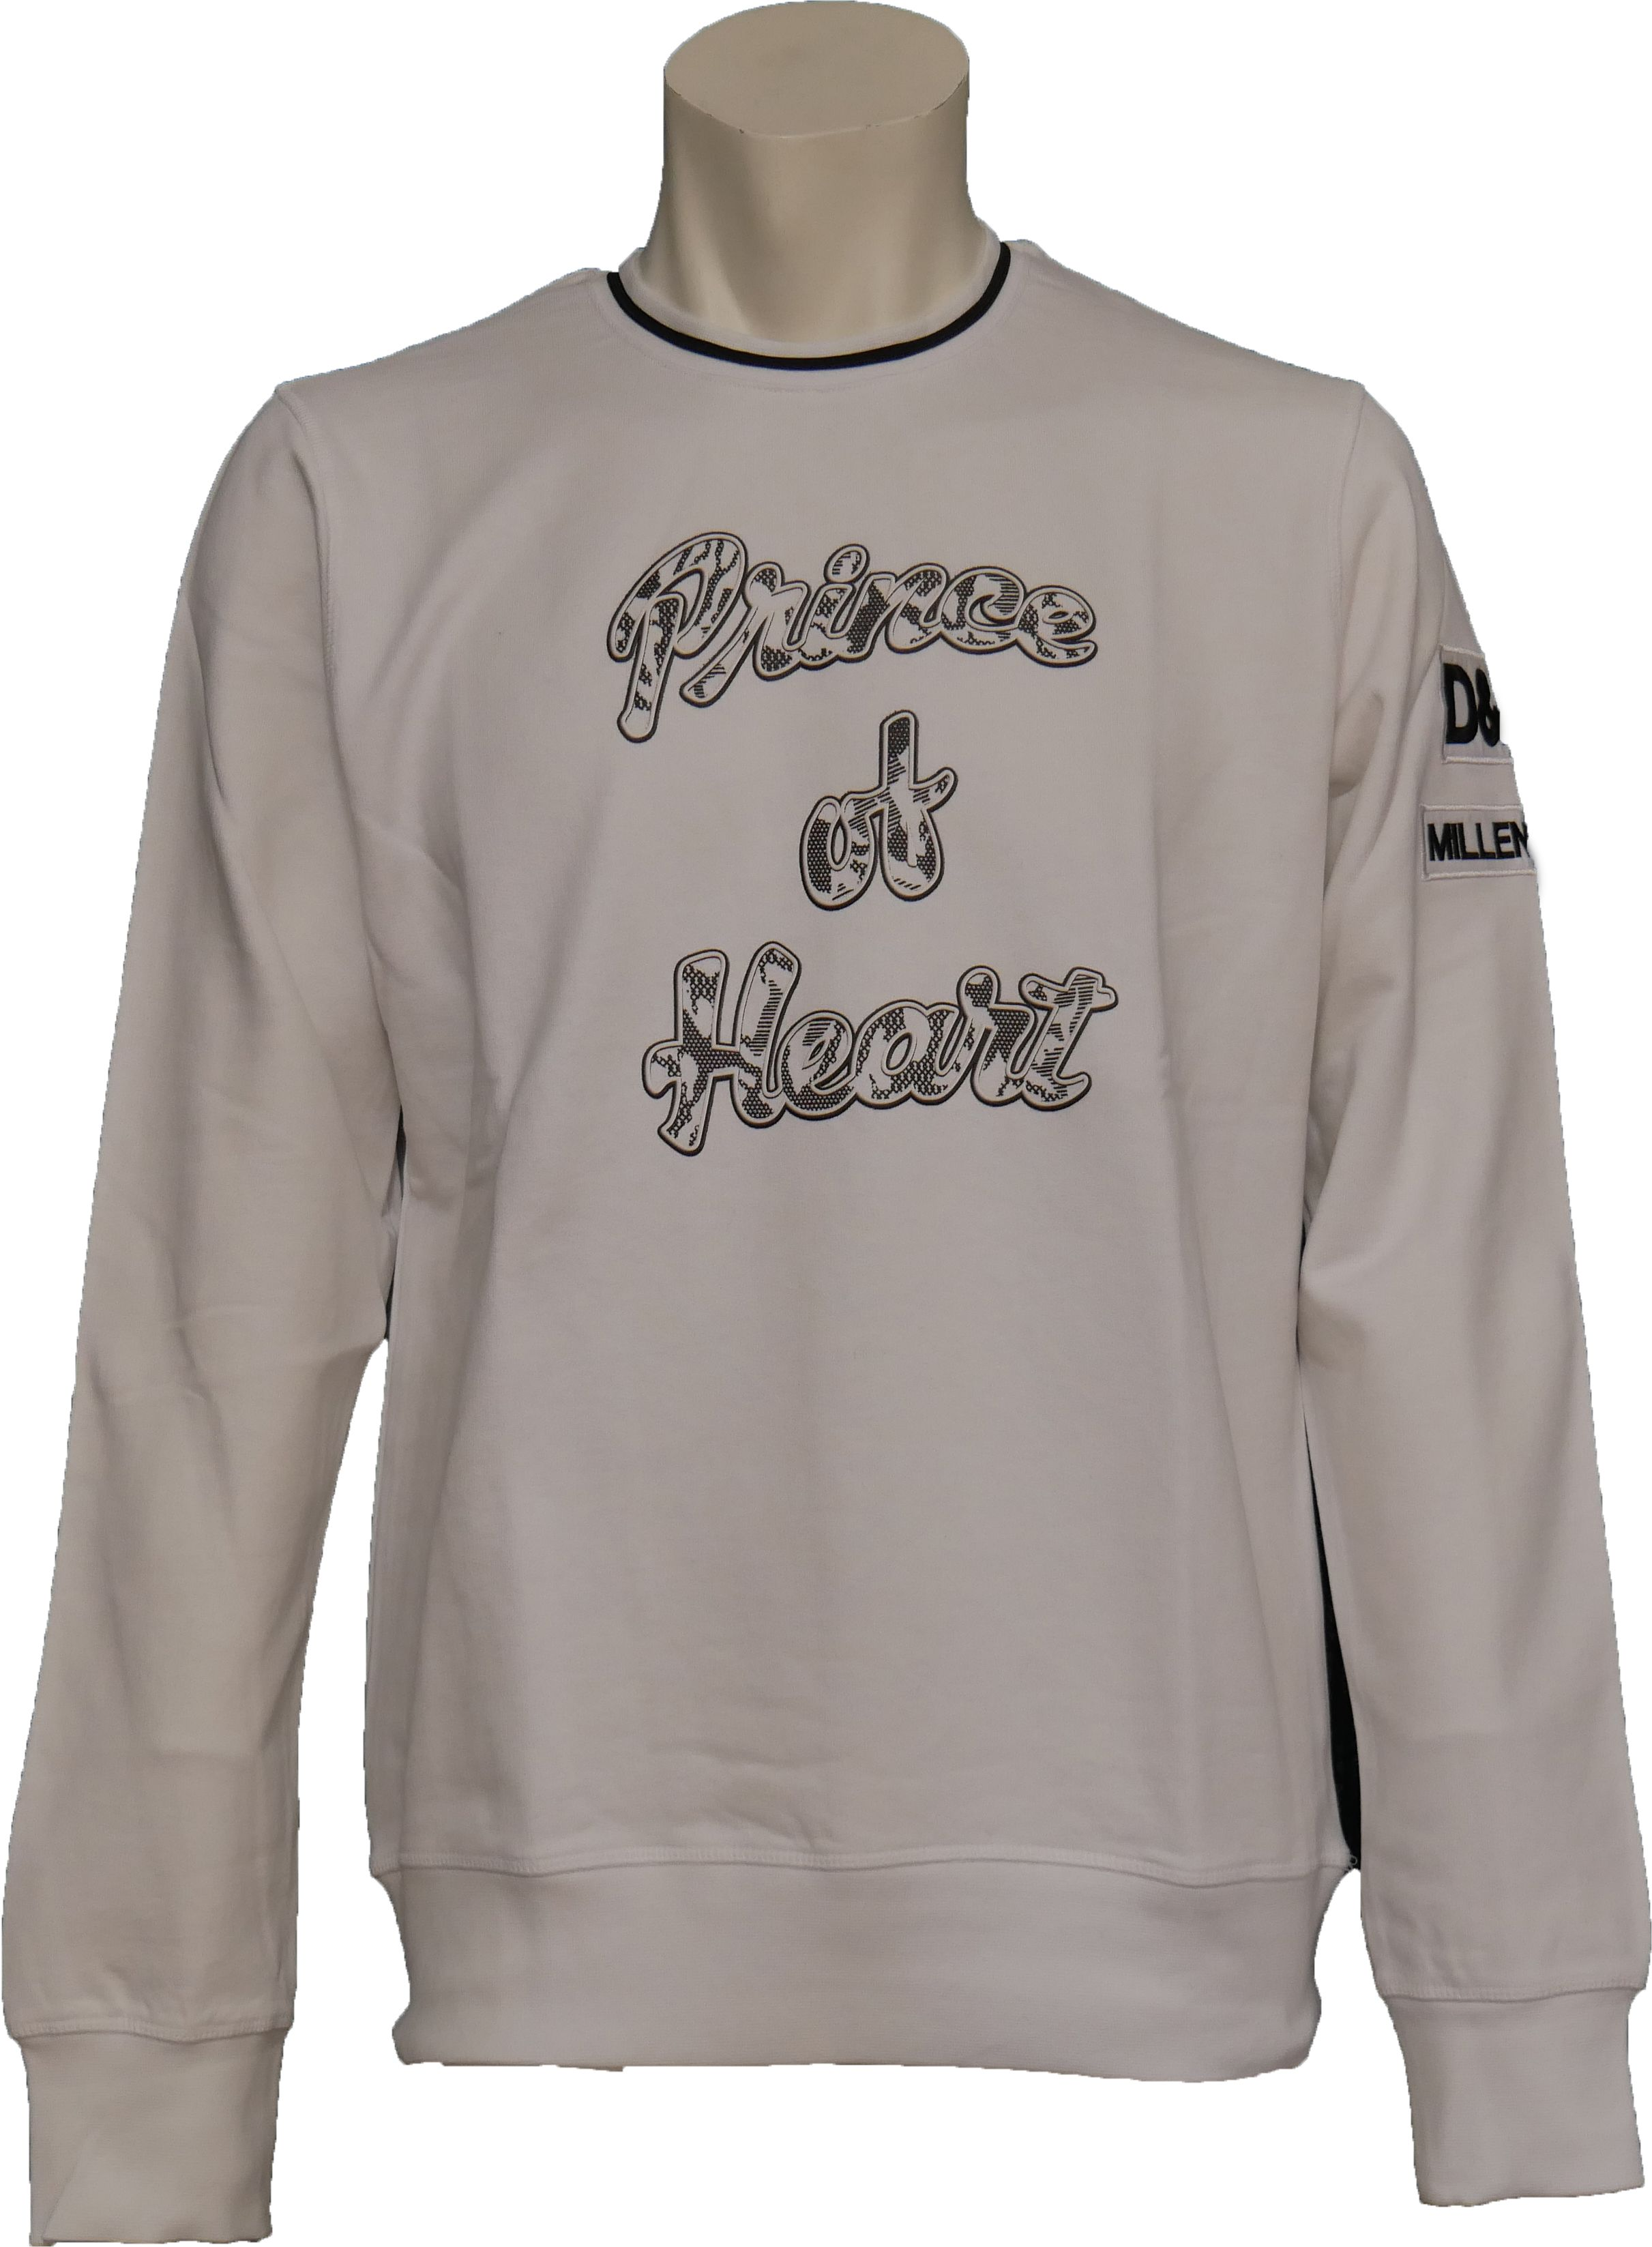 dolce & gabbana pullover / pulóver | herren mode, mode